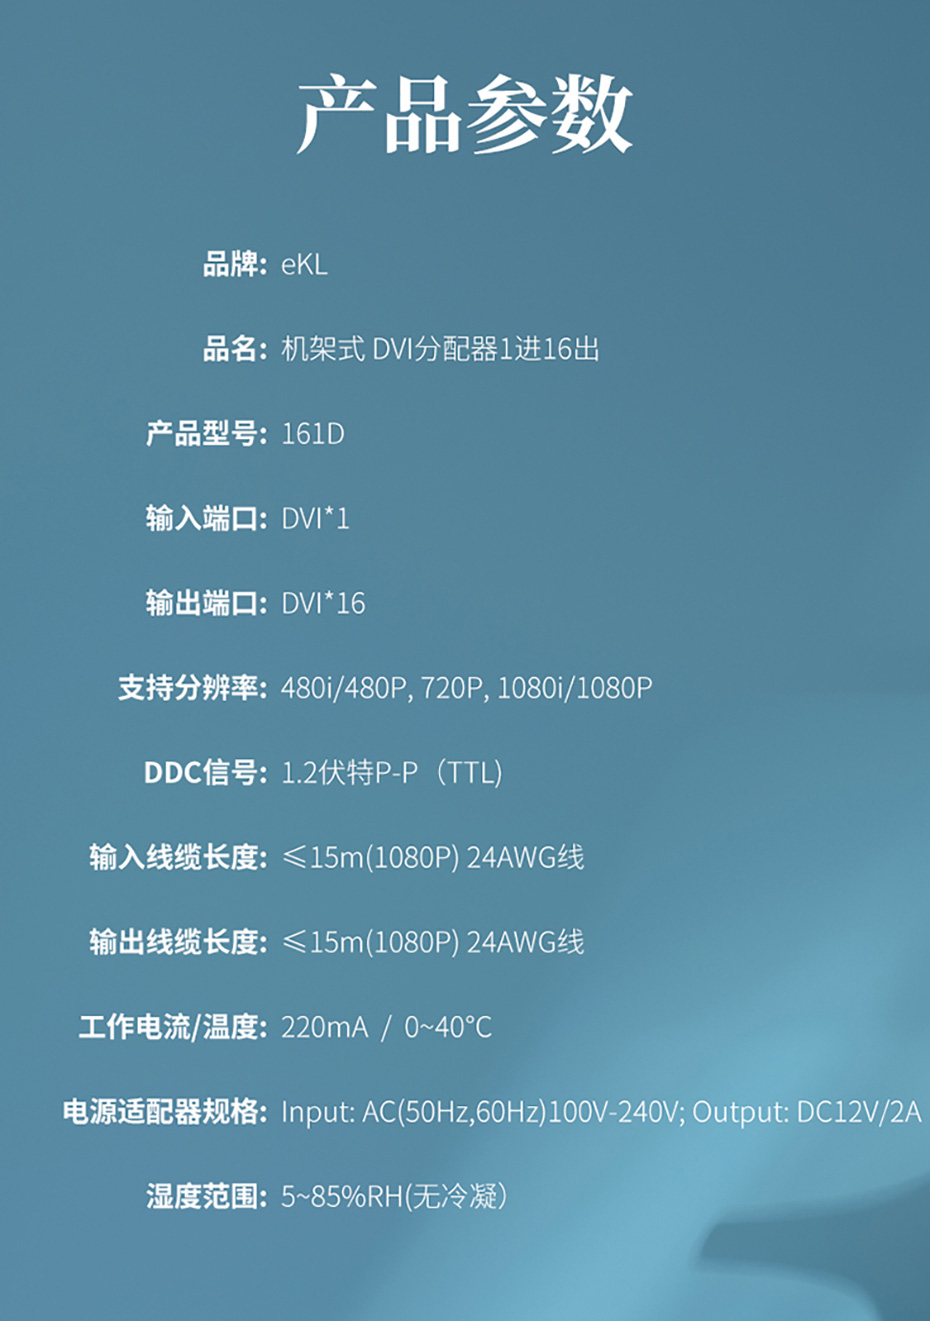 DVI分配器1分16 161D 规格参数